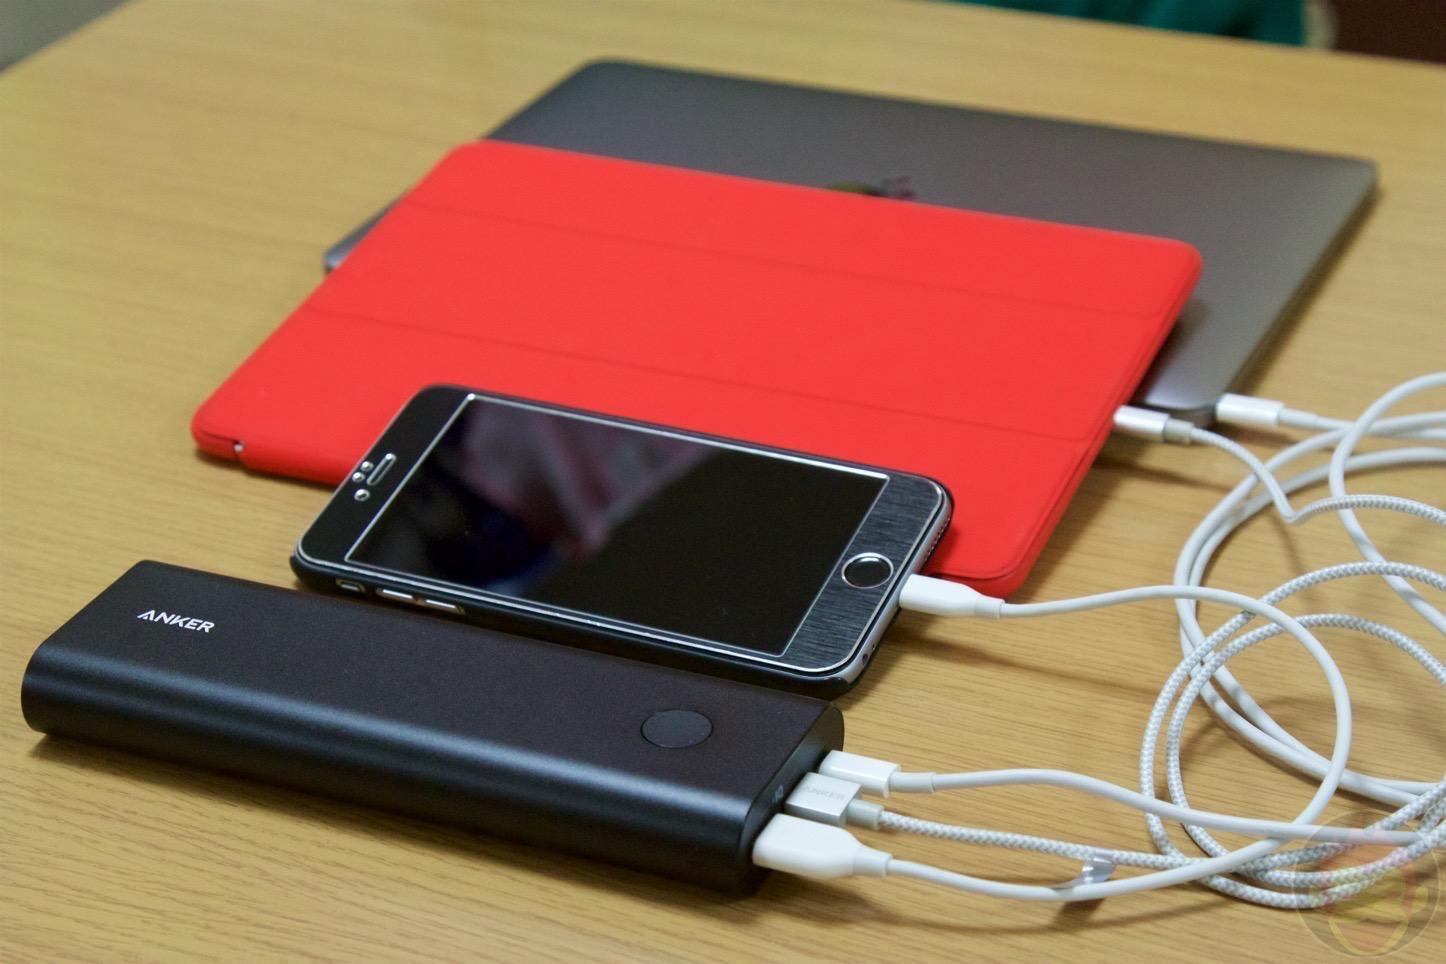 Anker PowerCorePlus 20100